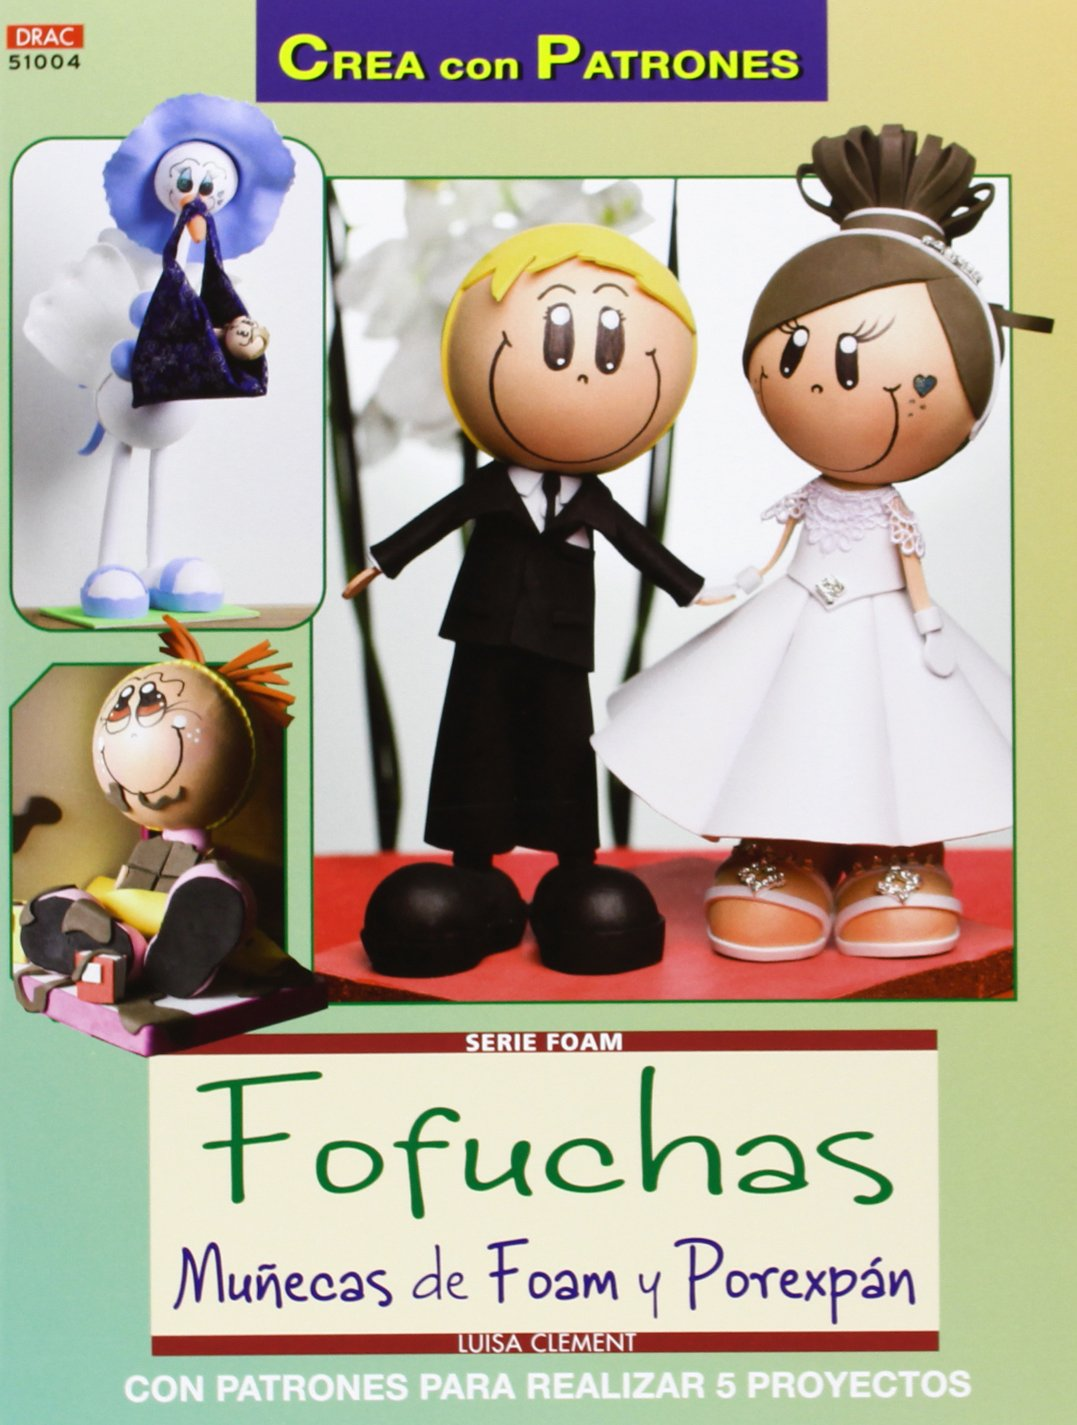 Foam nº 4 Fofuchas muñecas de foam y porexpan Crea Con ...